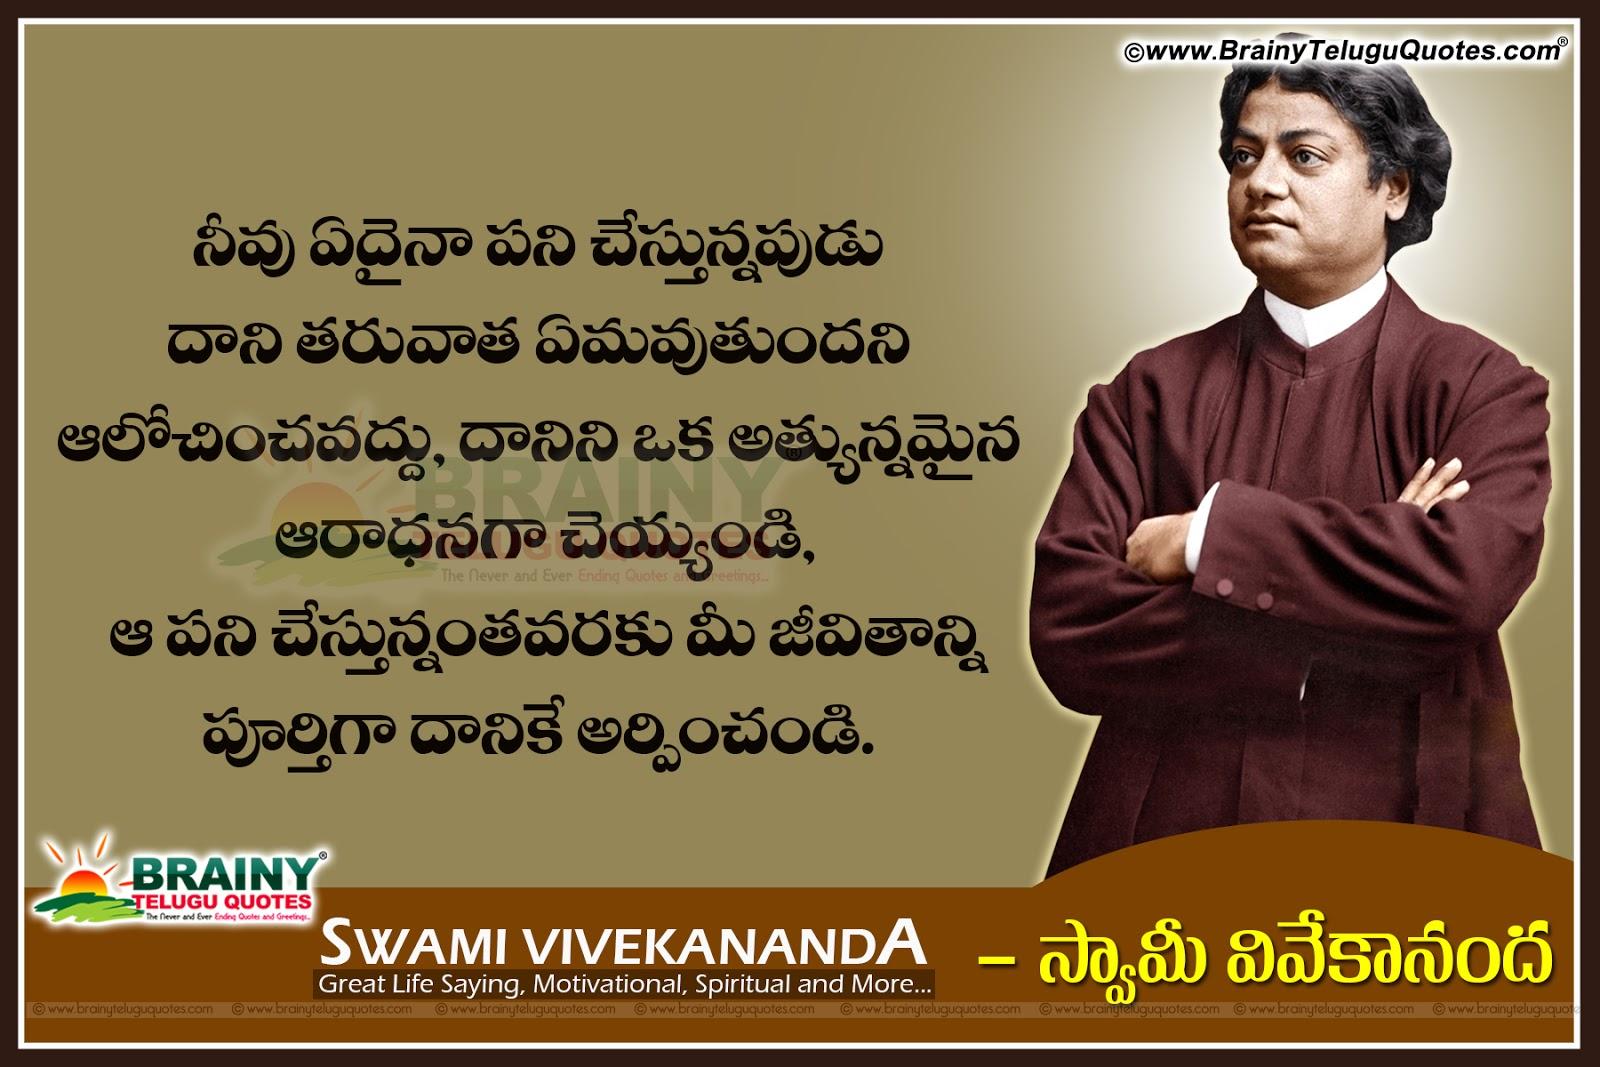 swami vivekanandha thoughts in telugu brainyteluguquotes